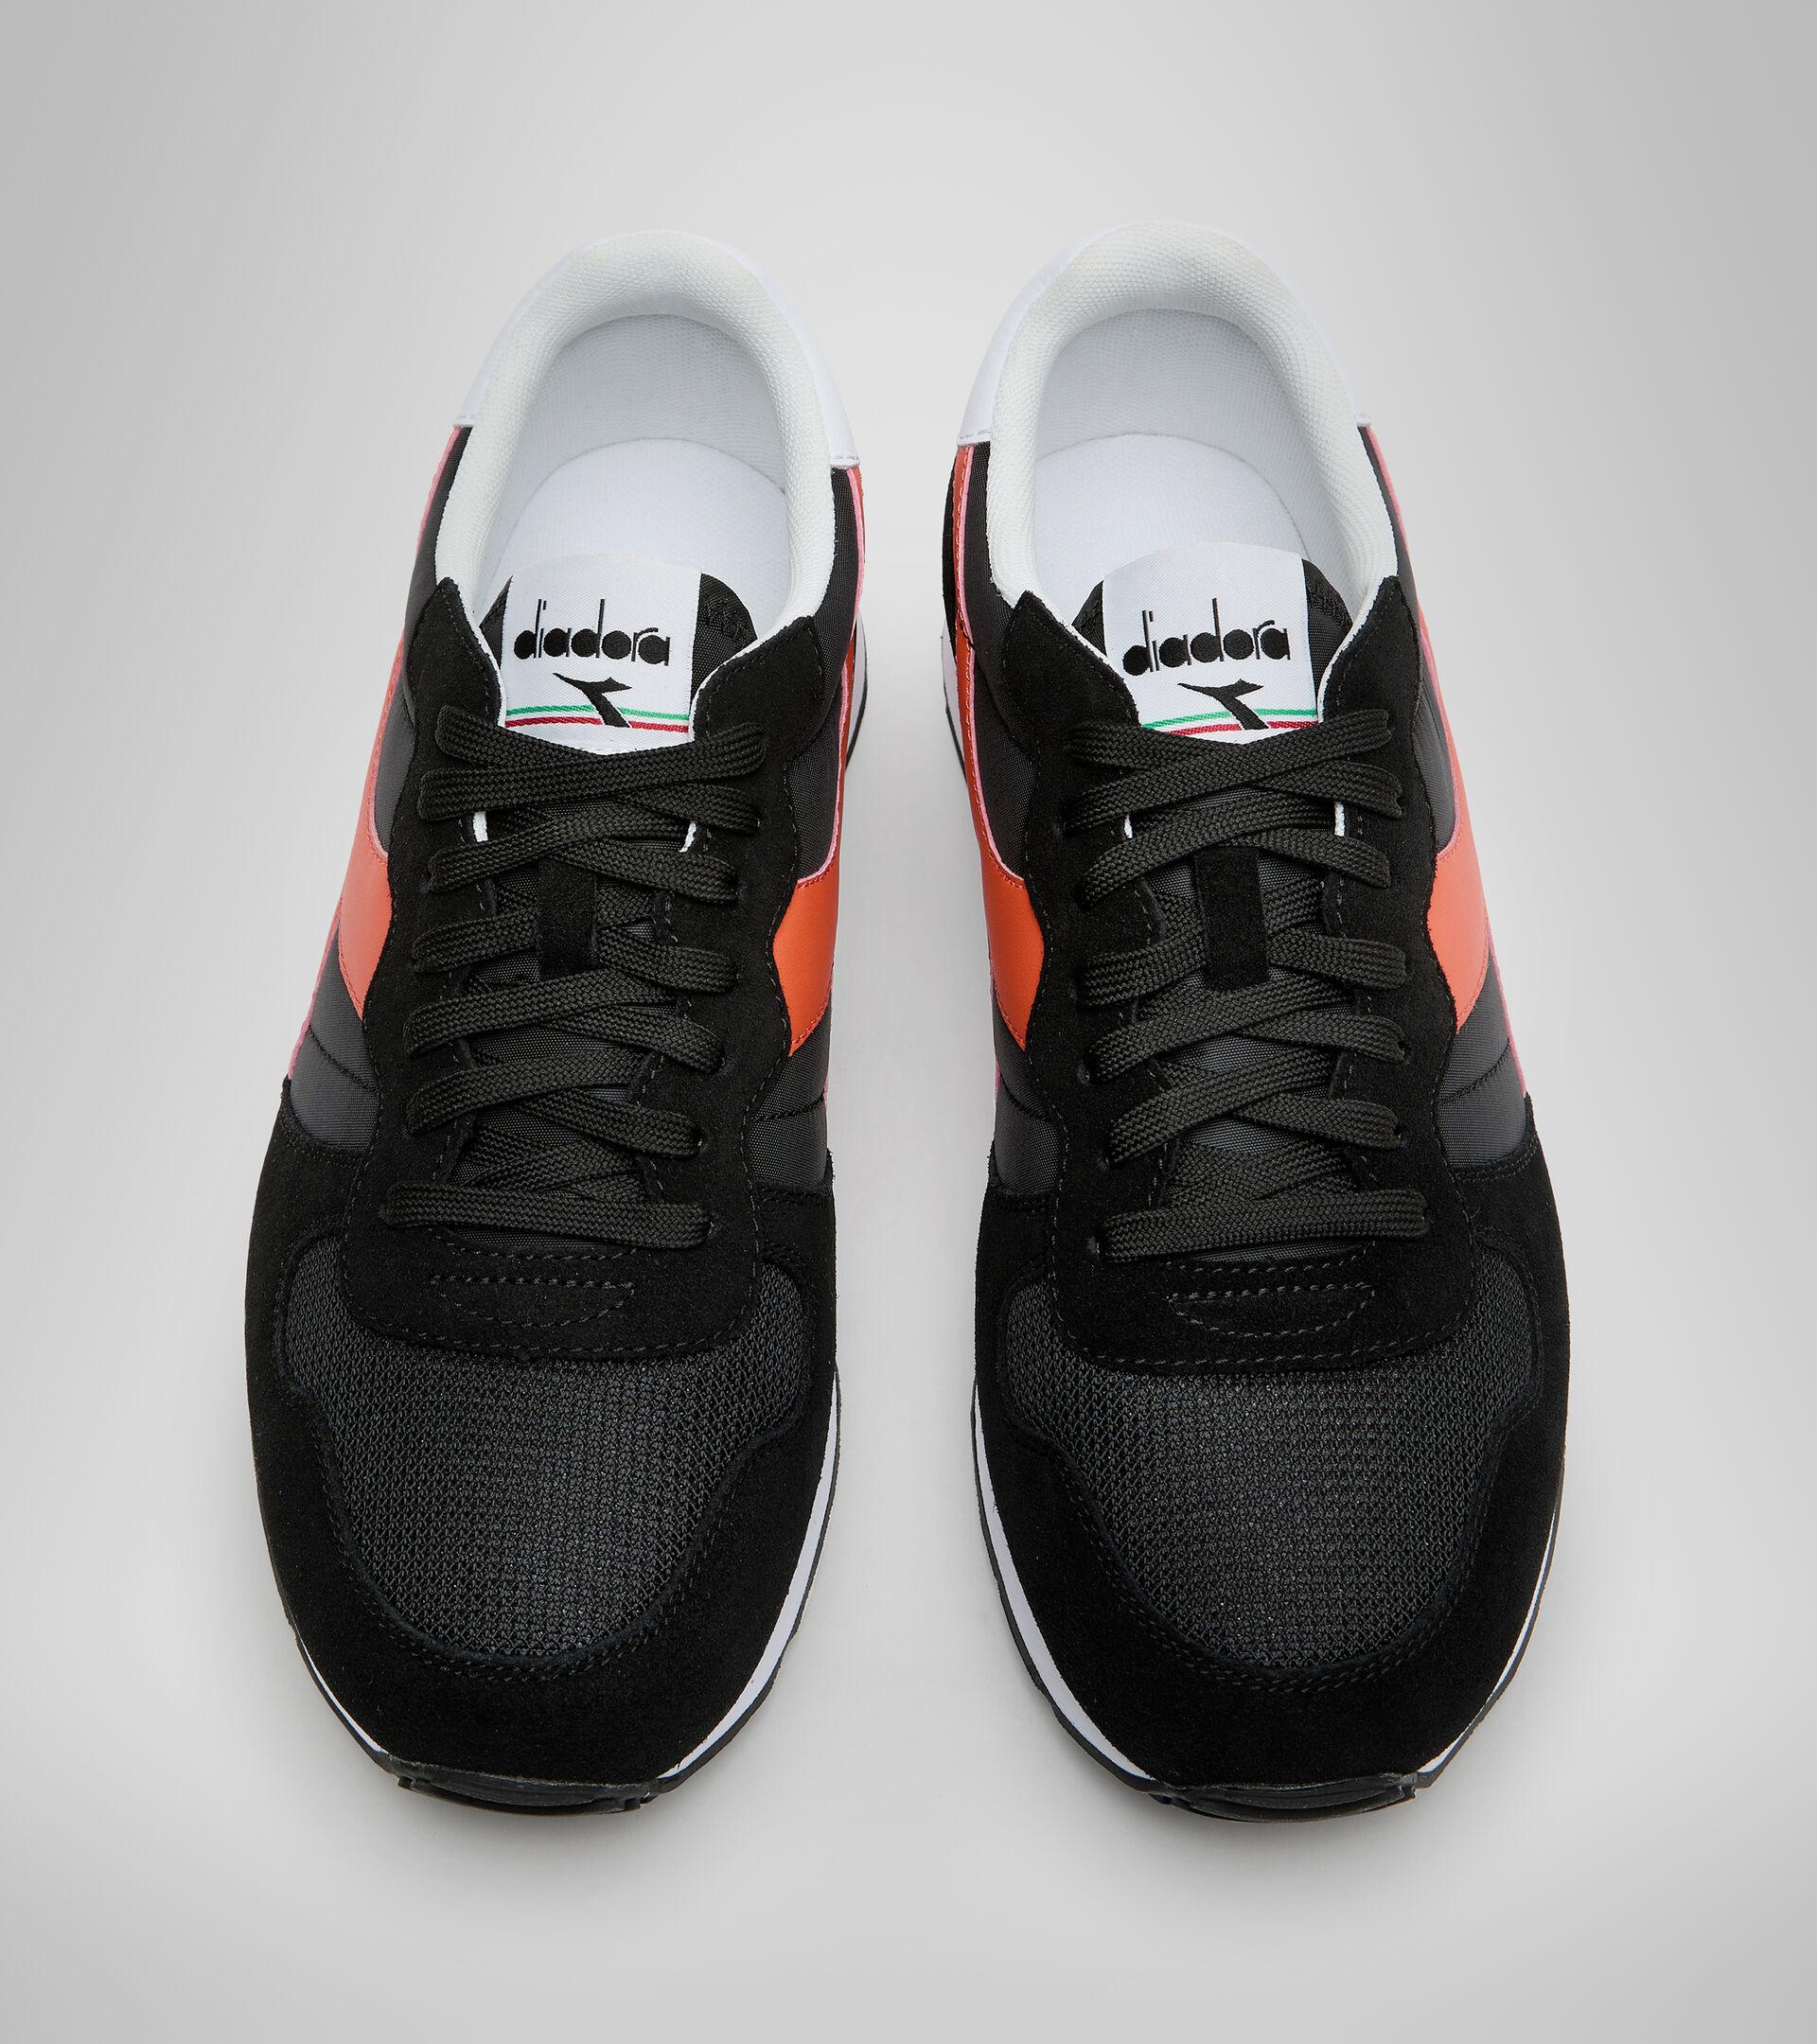 Footwear Sportswear UNISEX CAMARO NEGRO/ROJO LIRIO ATIGRADO Diadora